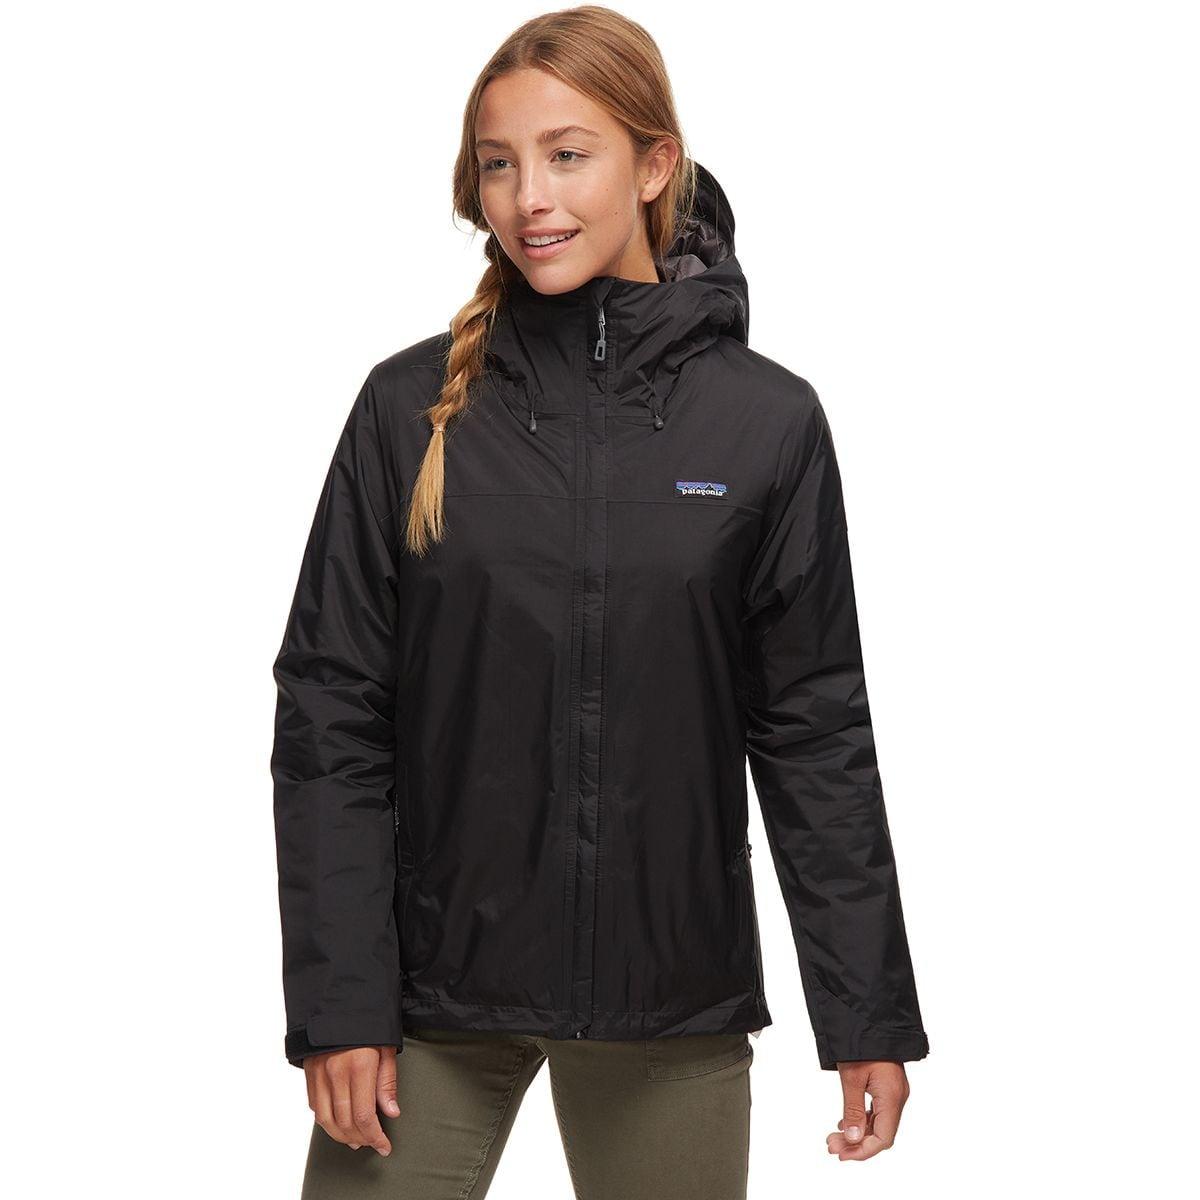 Patagonia Torrentshell Insulated Jacket - Women